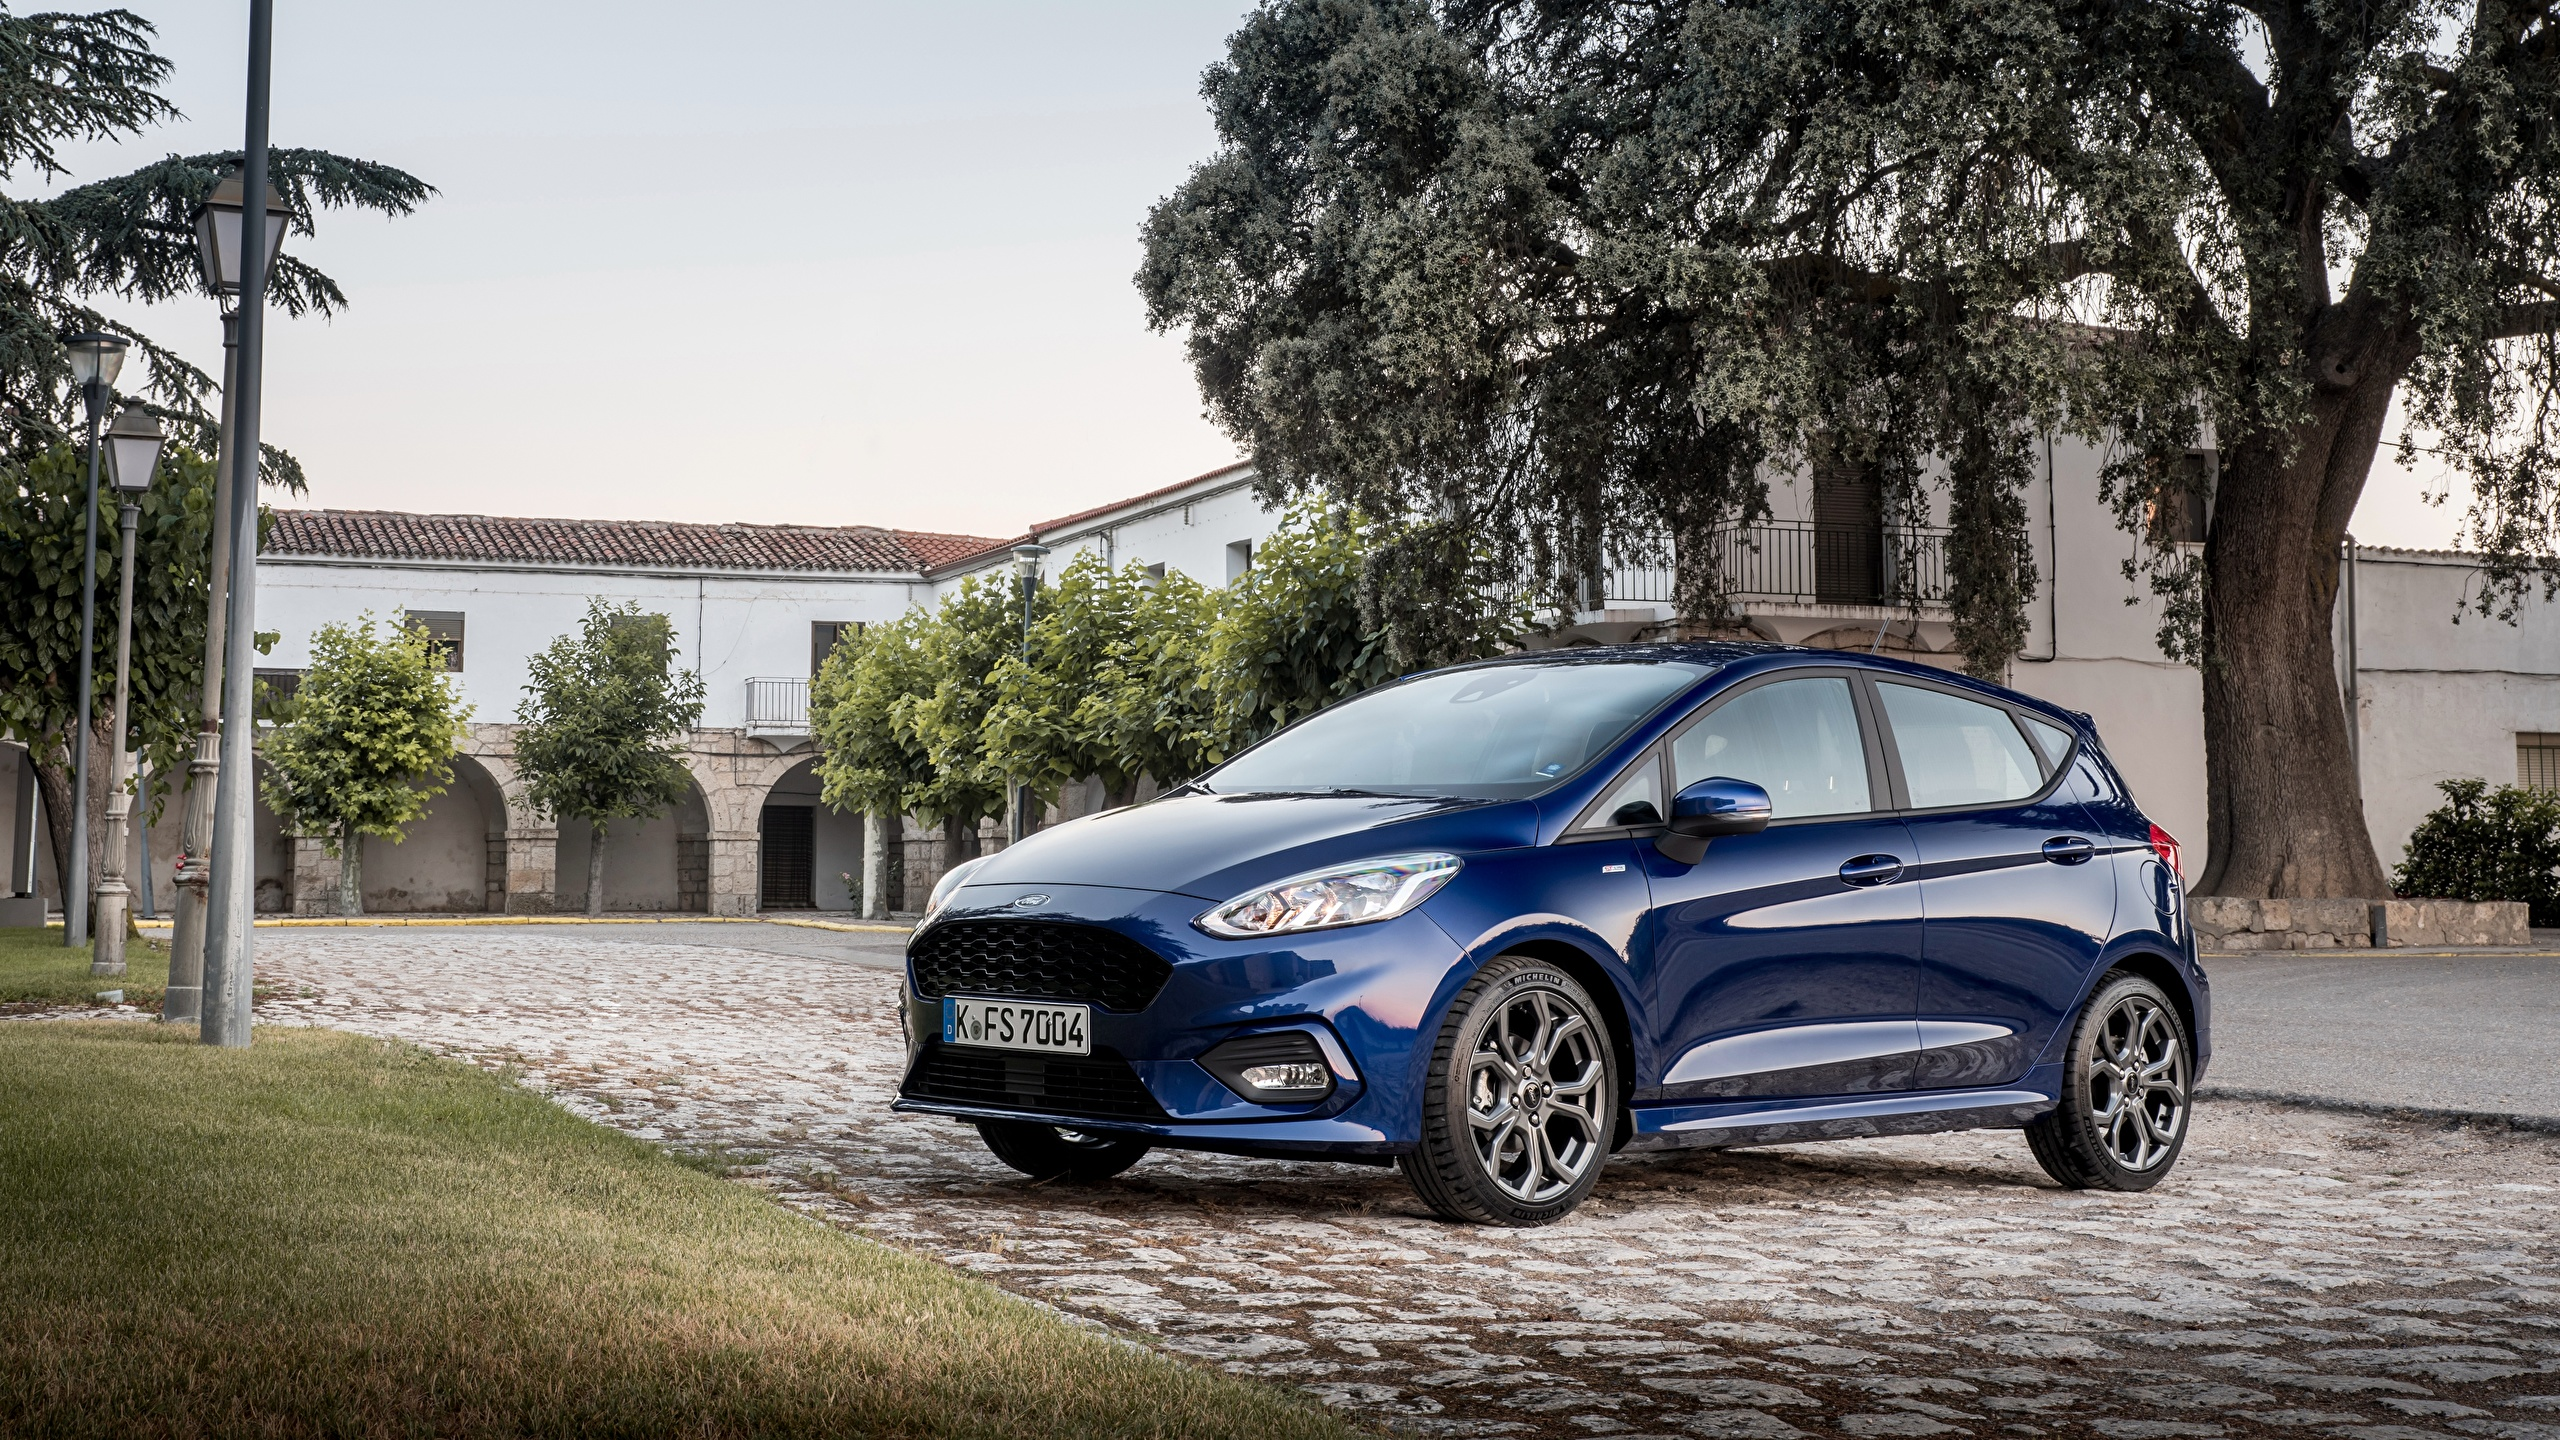 Ford Fiesta St Line 2018 Blue 2560x1440 Wallpaper Teahub Io